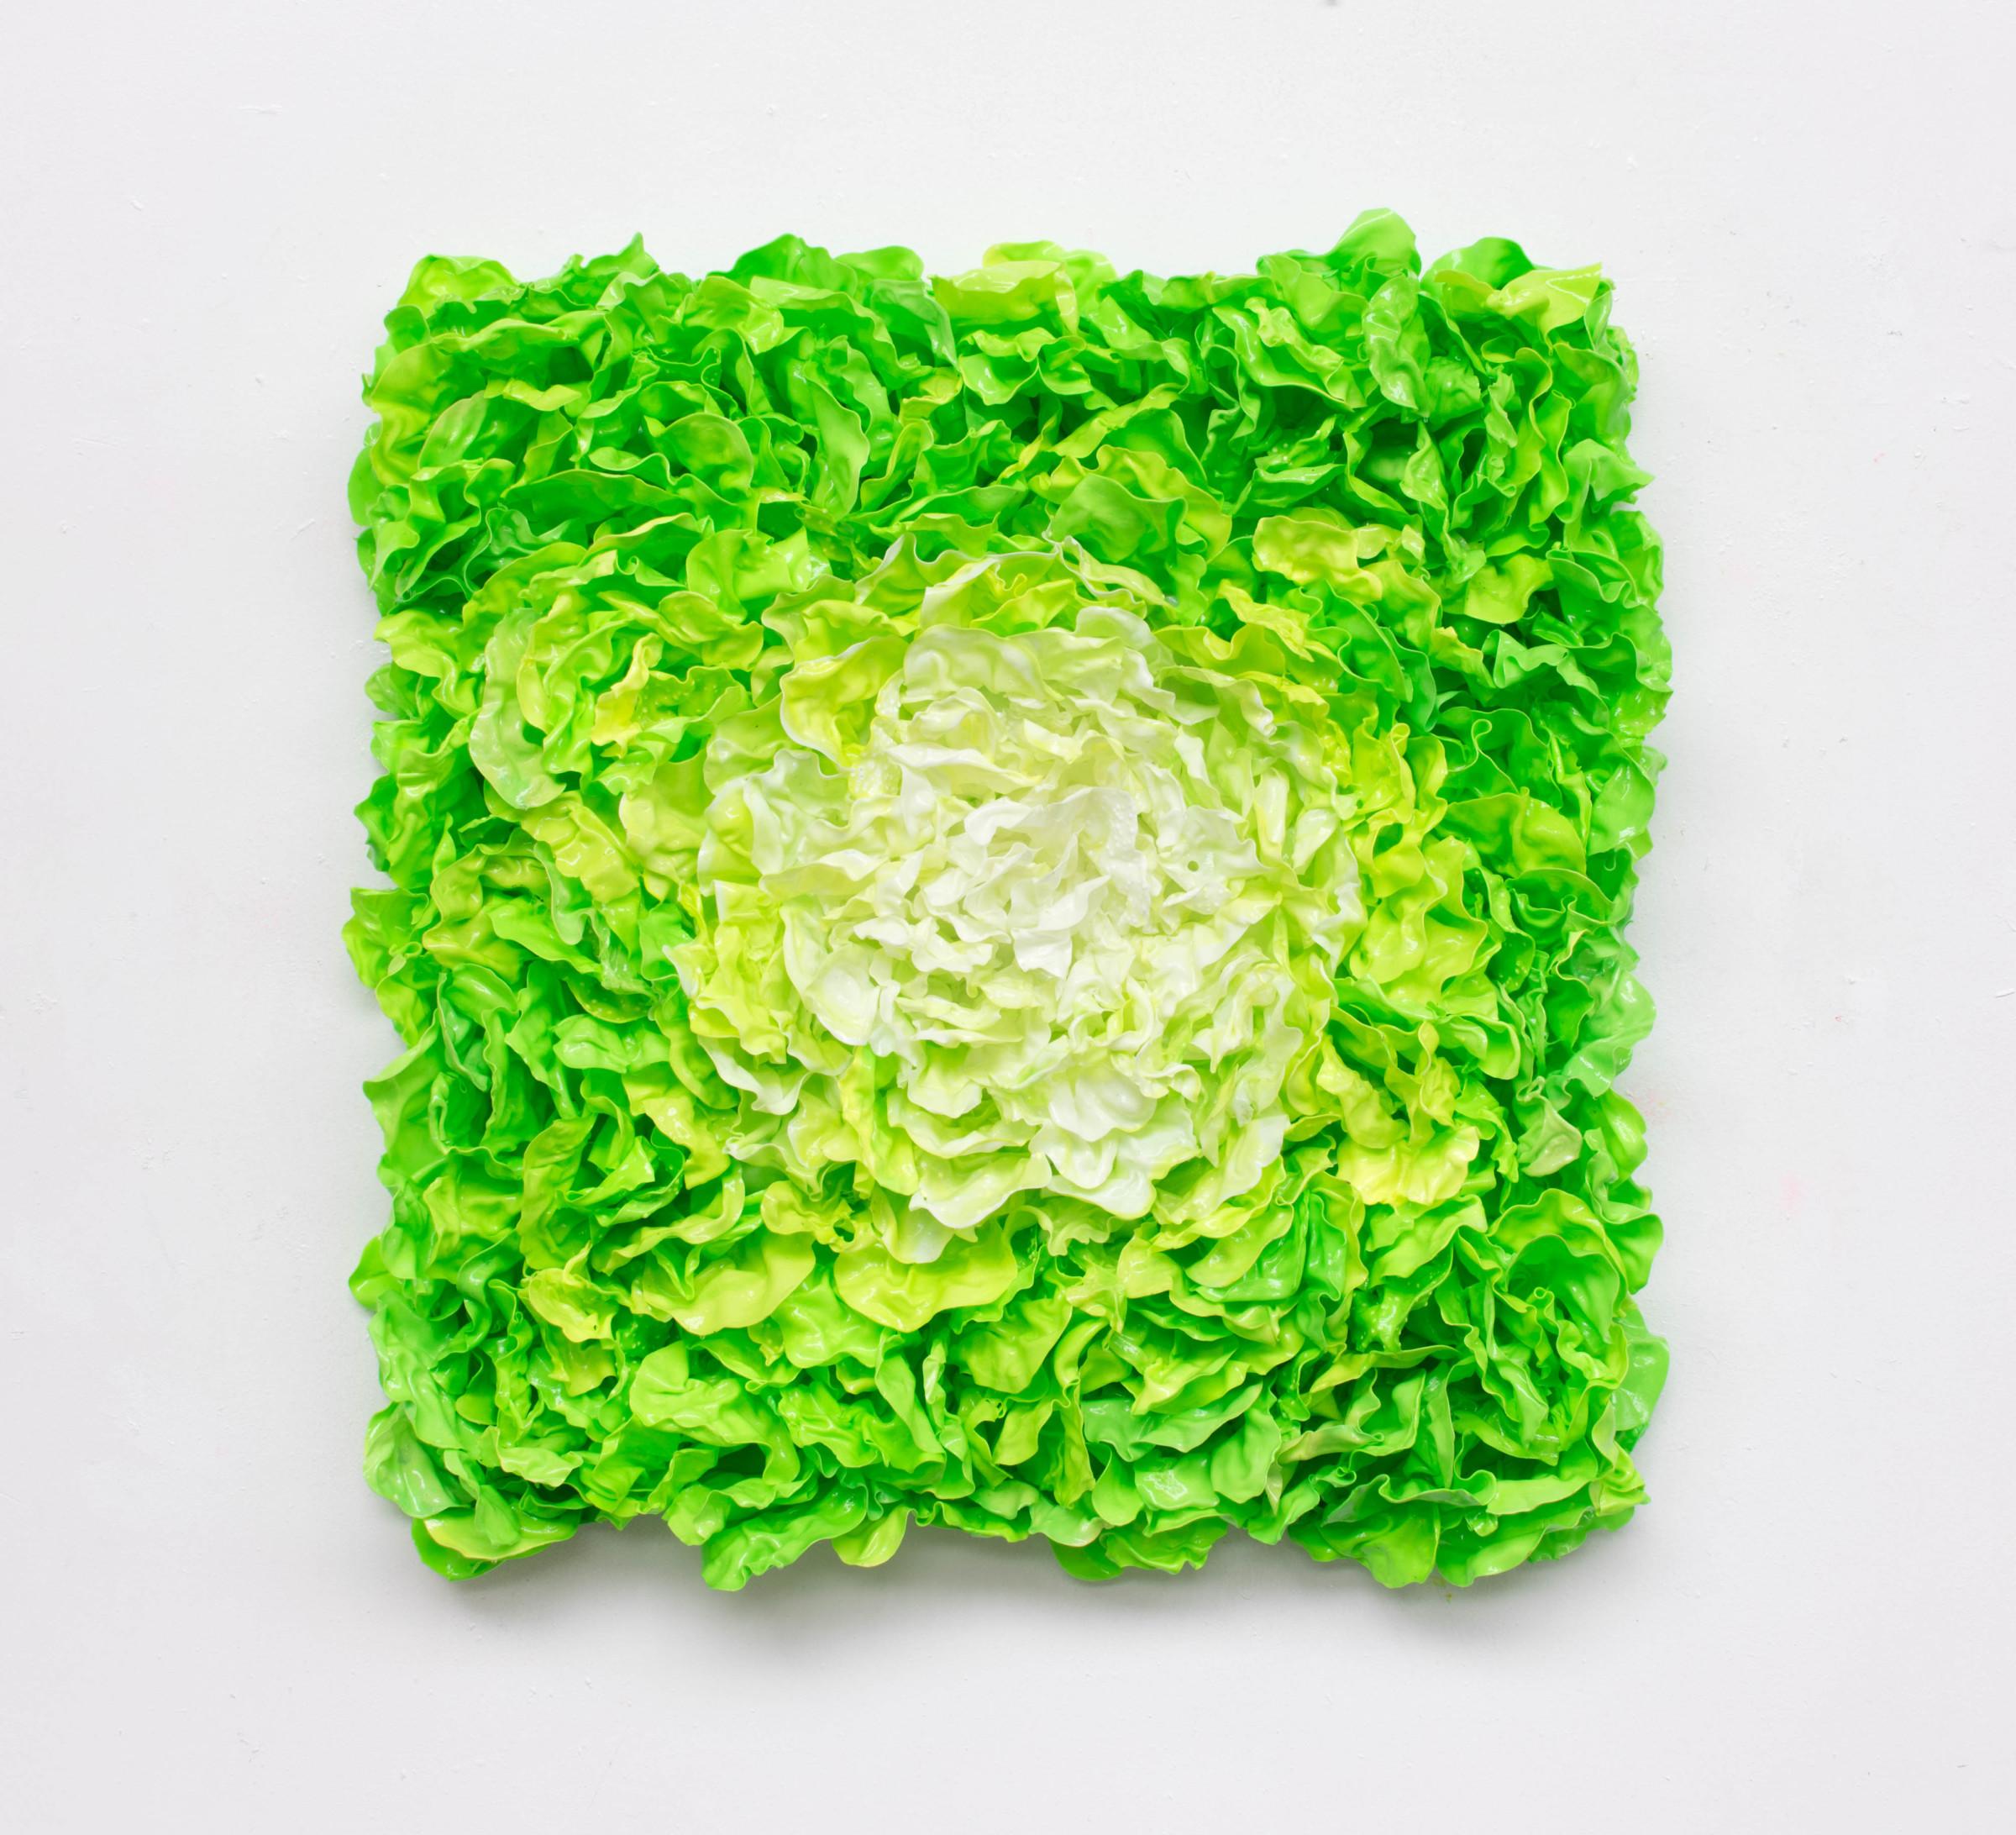 "<span class=""link fancybox-details-link""><a href=""/artists/42-stefan-gross/works/5313-stefan-gross-lettuce-ii-2019/"">View Detail Page</a></span><div class=""artist""><strong>Stefan Gross</strong></div> <div class=""title""><em>Lettuce - II</em>, 2019</div> <div class=""medium"">Oil Plastic</div> <div class=""dimensions"">100 x 100 x 20 cm</div><div class=""price"">€8,500.00</div>"